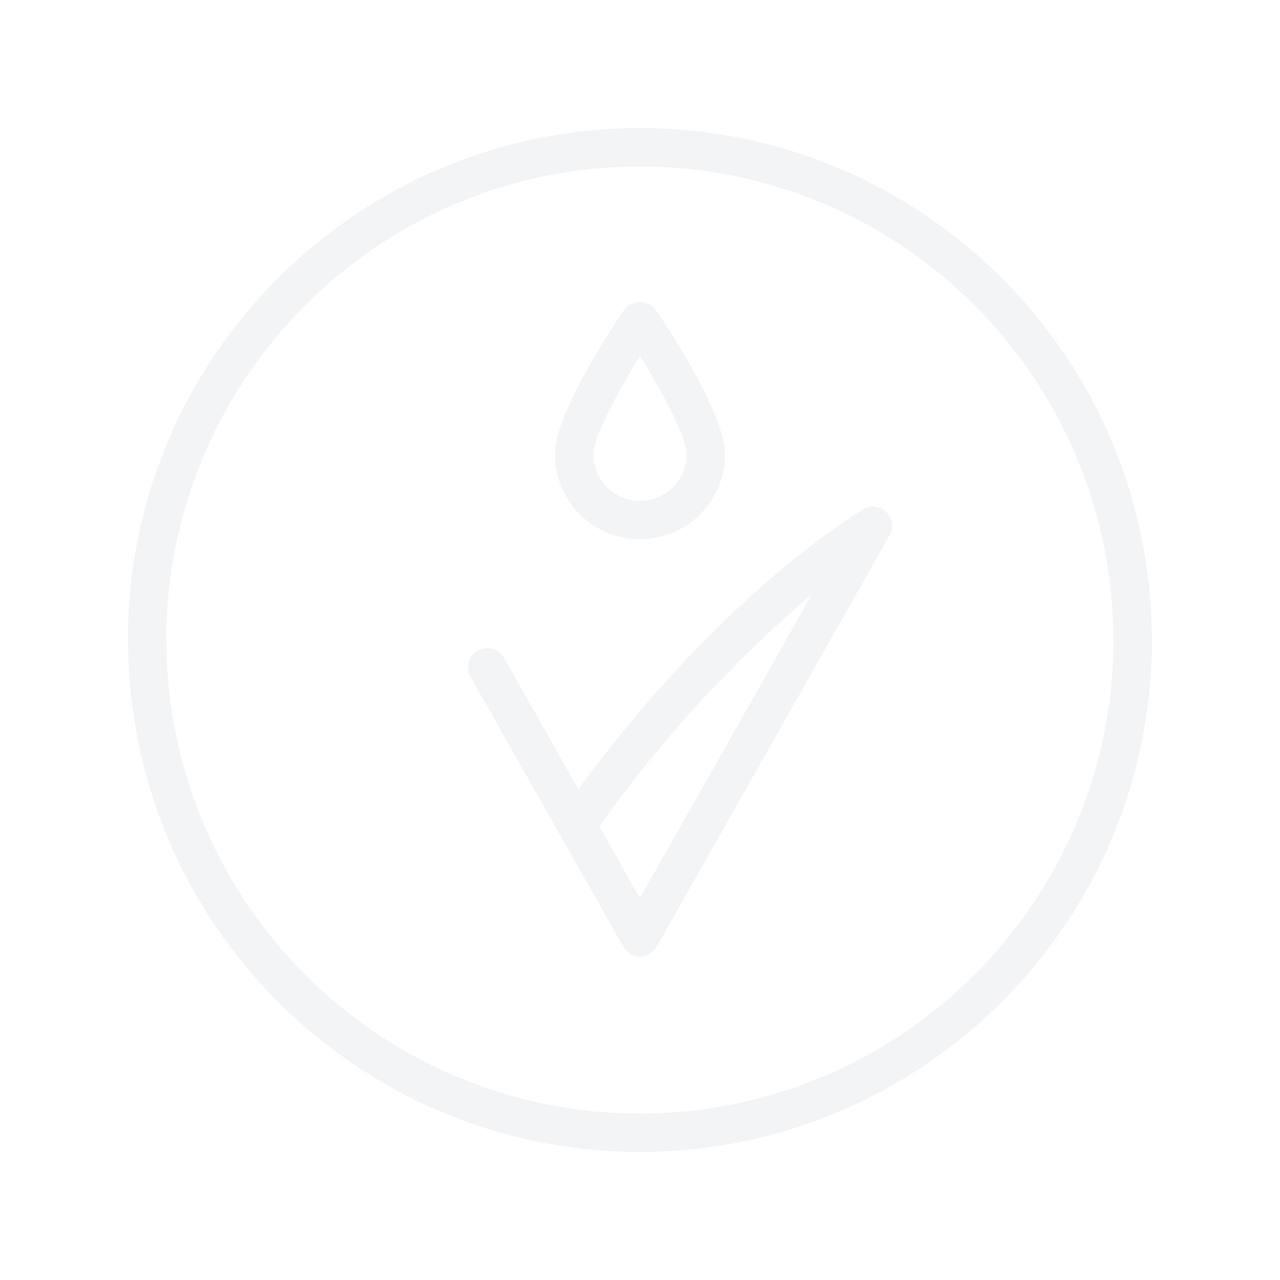 PHYTO Phytopolleine Scalp растительный стимулятор 25ml